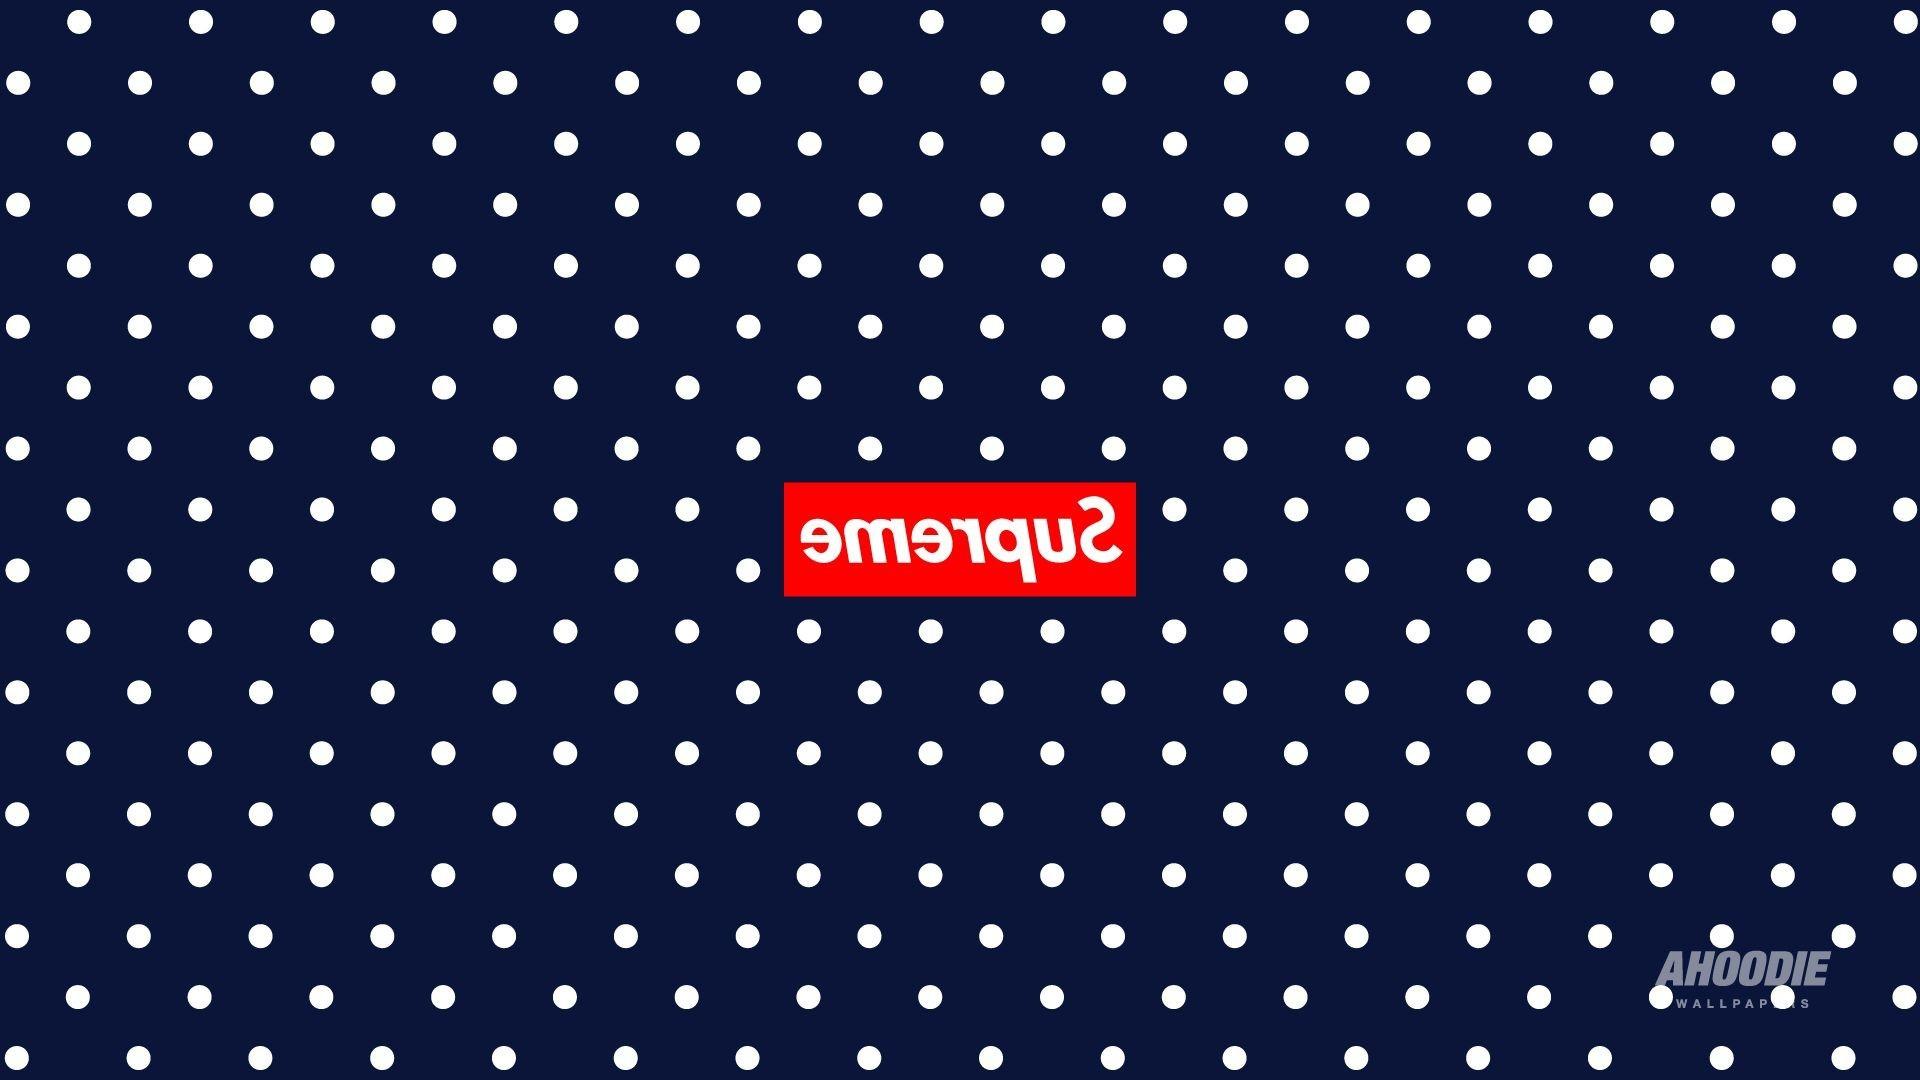 Polka Dot Wallpaper For Computer 66 Images